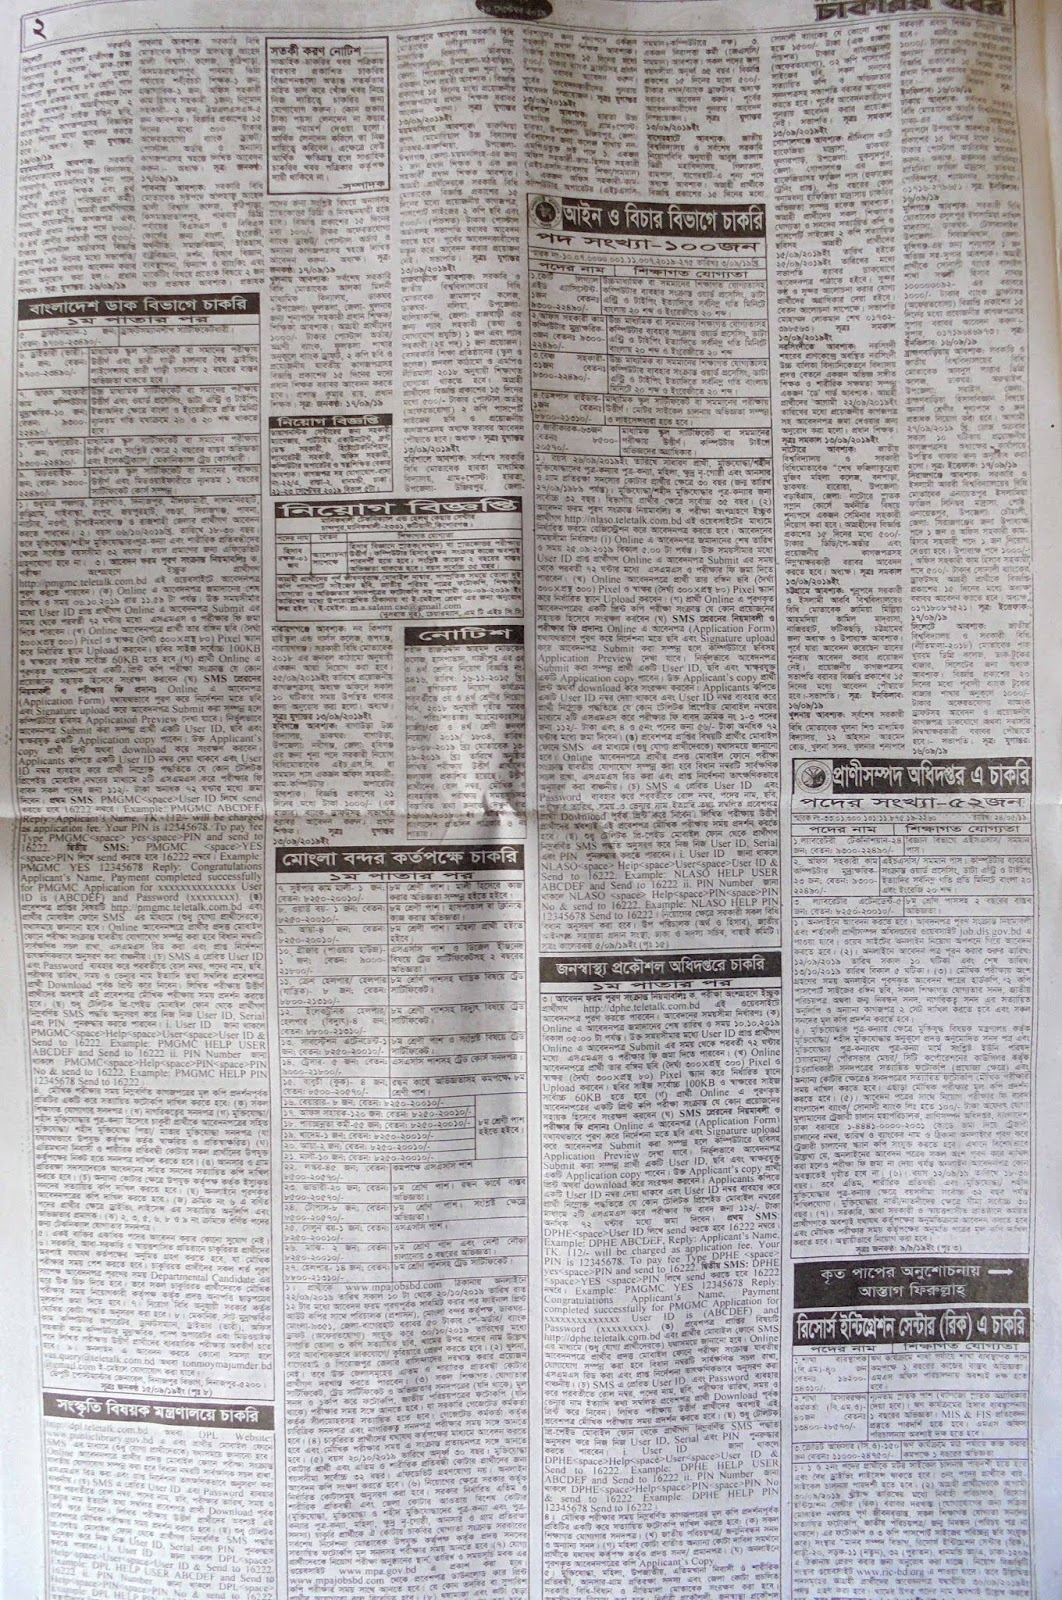 circular circular in Bangladesh,all jobs,new job today, newspaper,ngo job circular, chakrir dak, bd job news bangla, chakrir khobor, bd govt chakrir khobor,engineering job in Bangladesh,